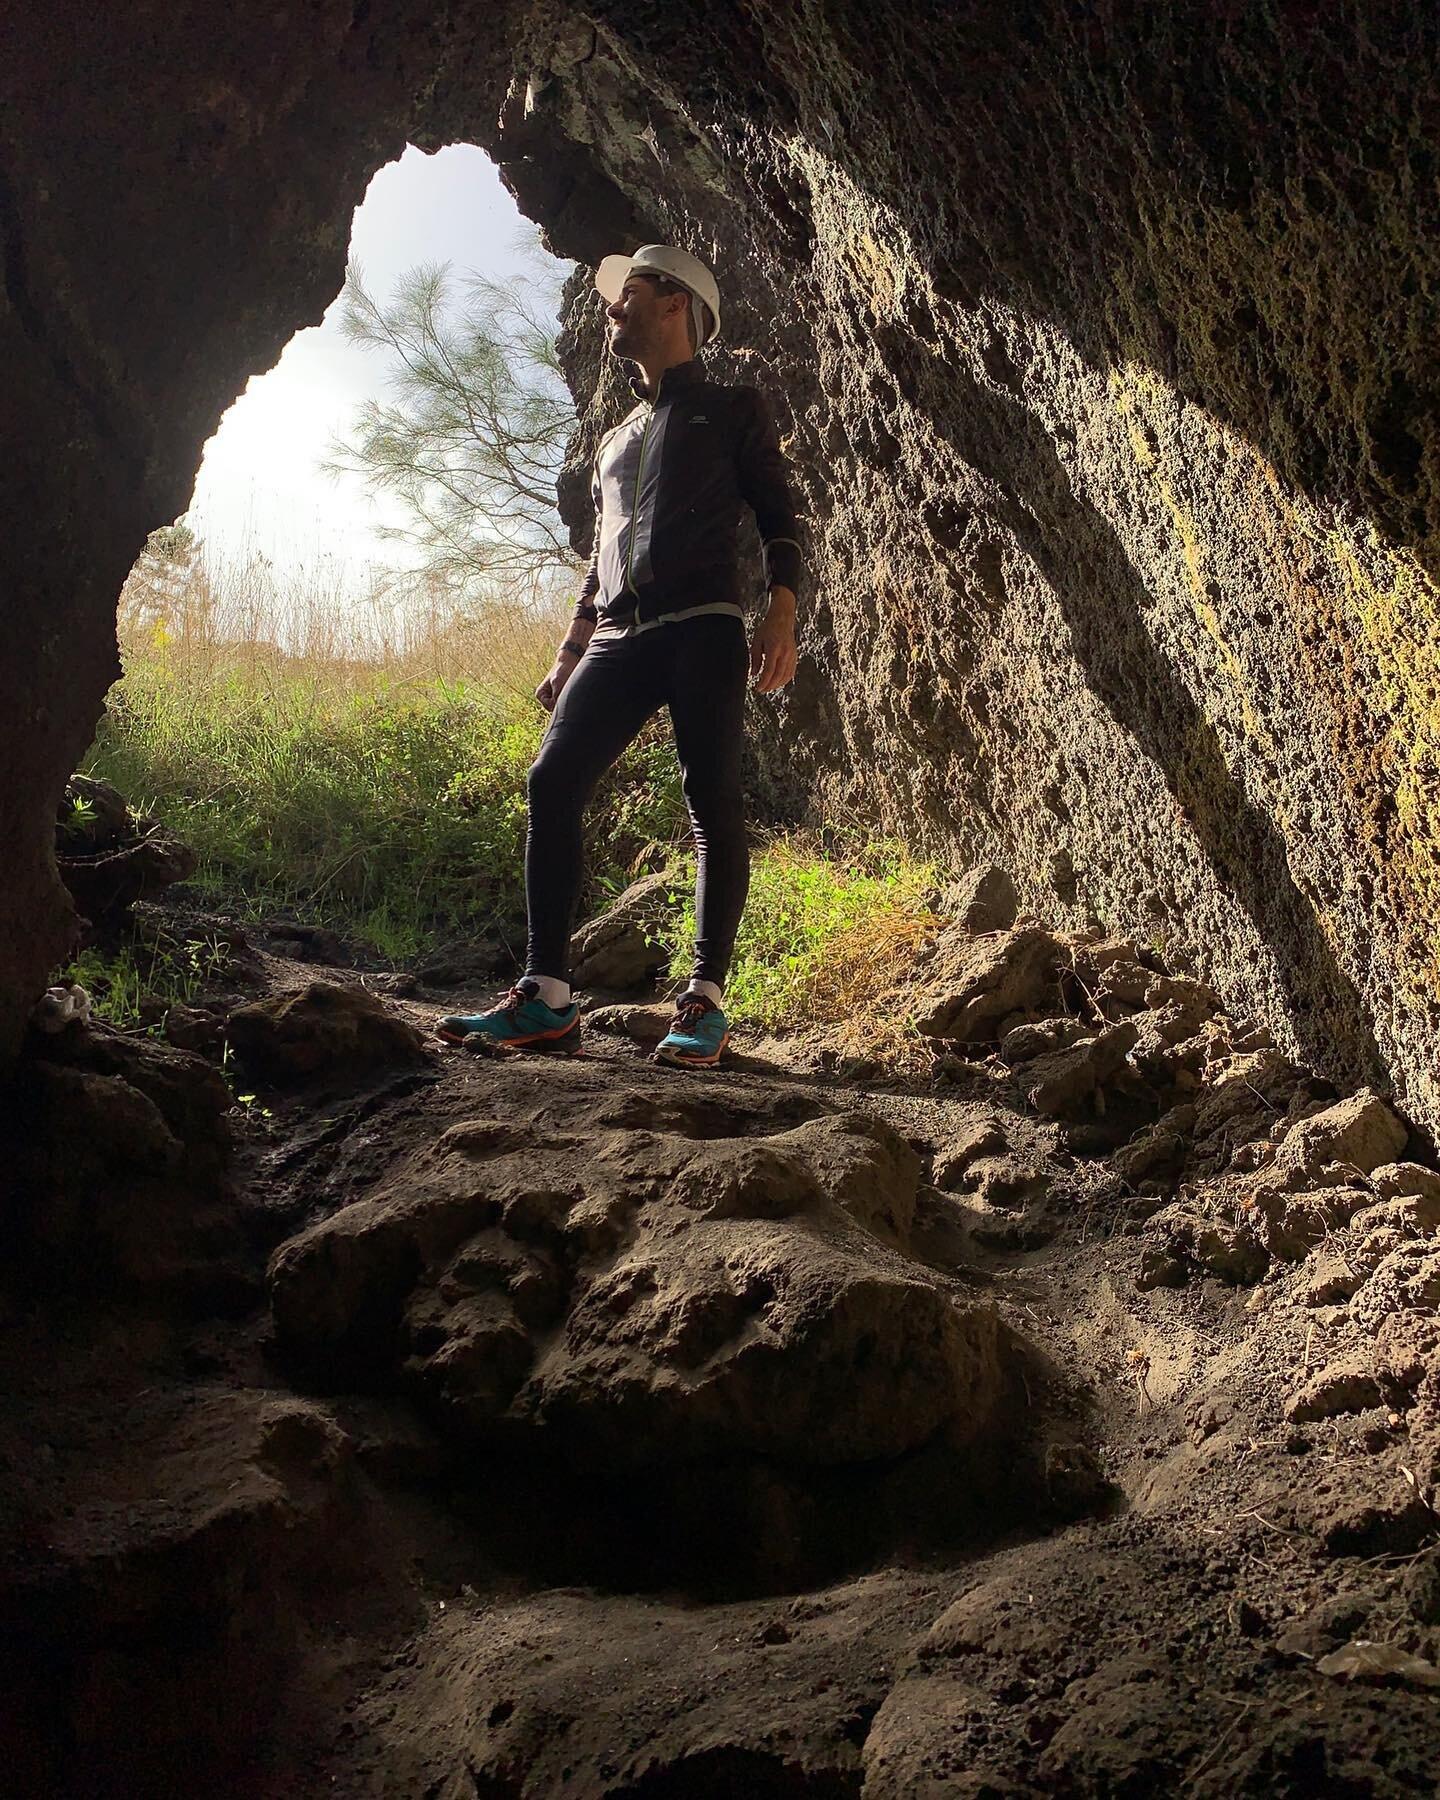 Francesco Costa e la sua trilogia sui Neanderthal